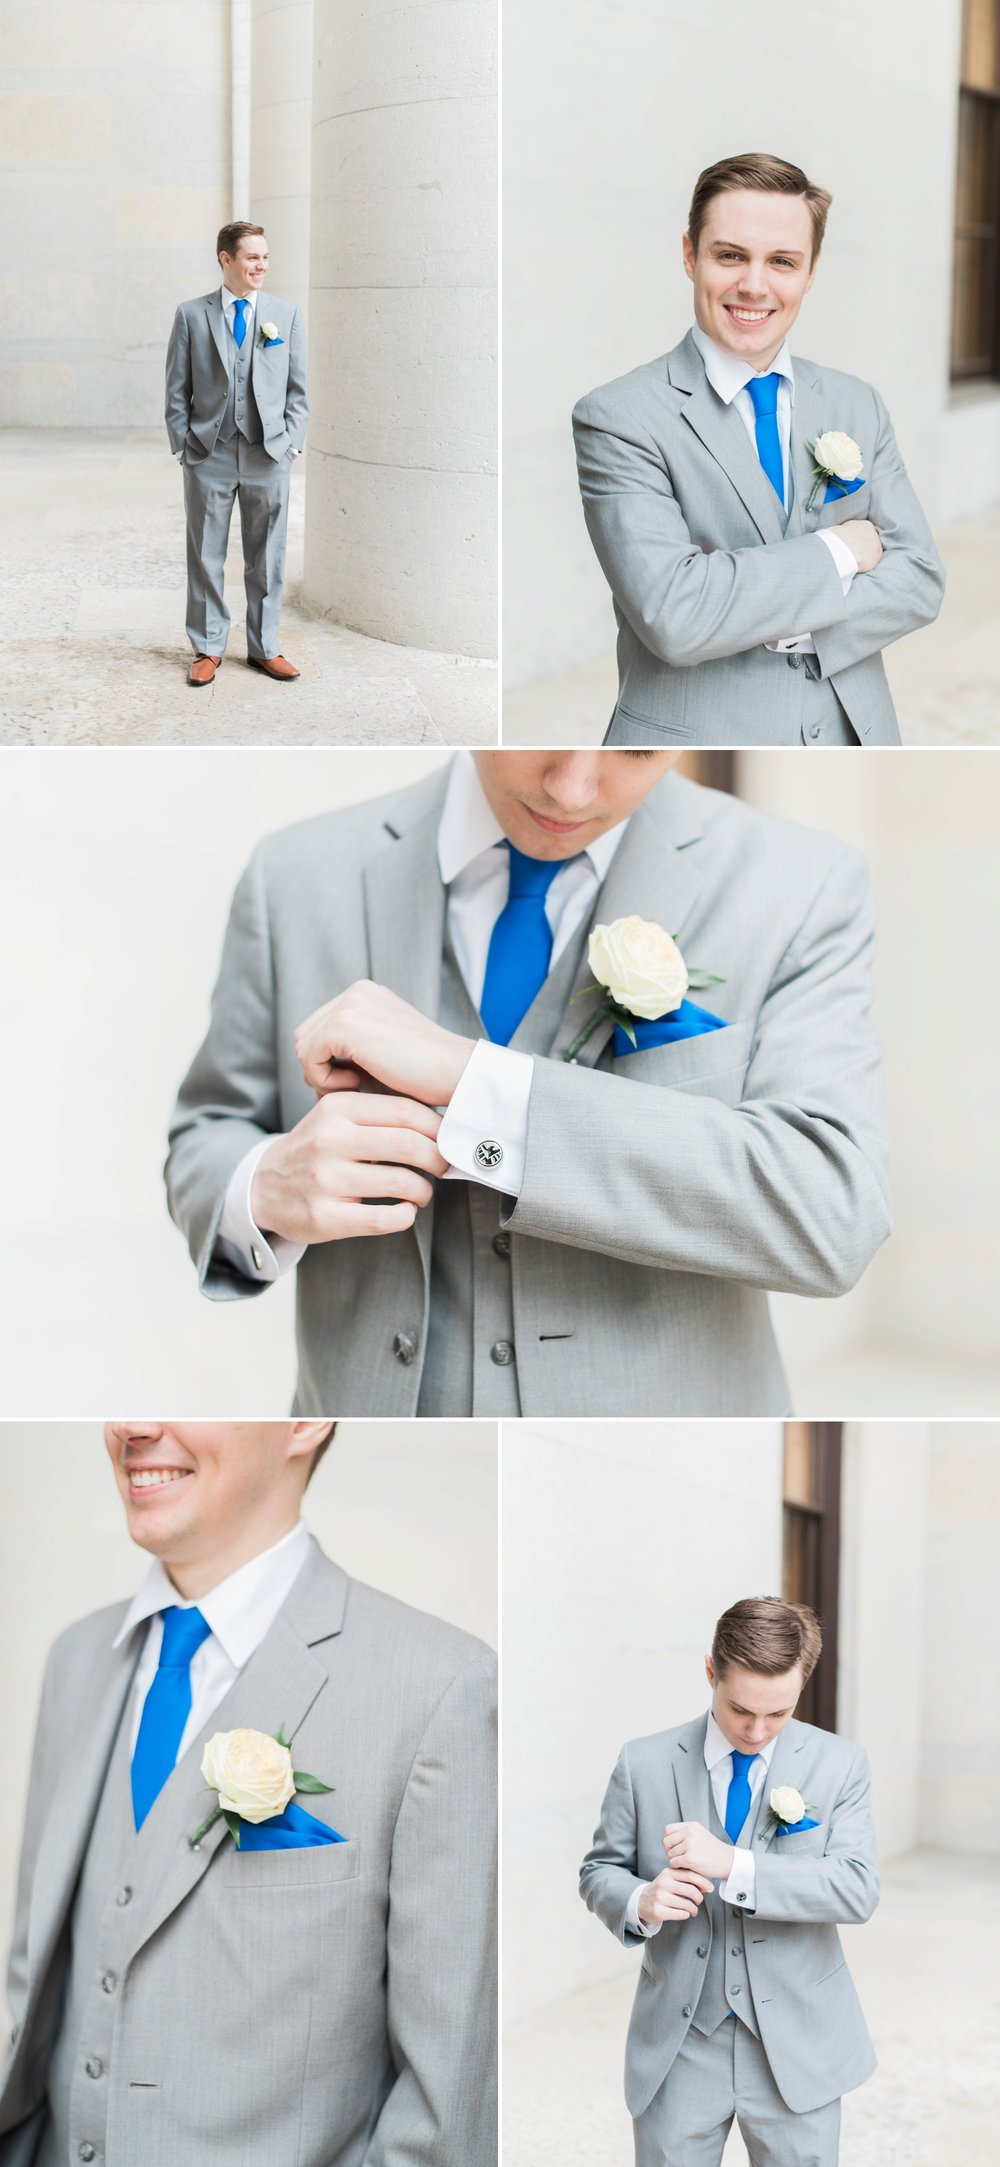 the-vault-columbus-ohio-wedding-emily-chris_0043.jpg